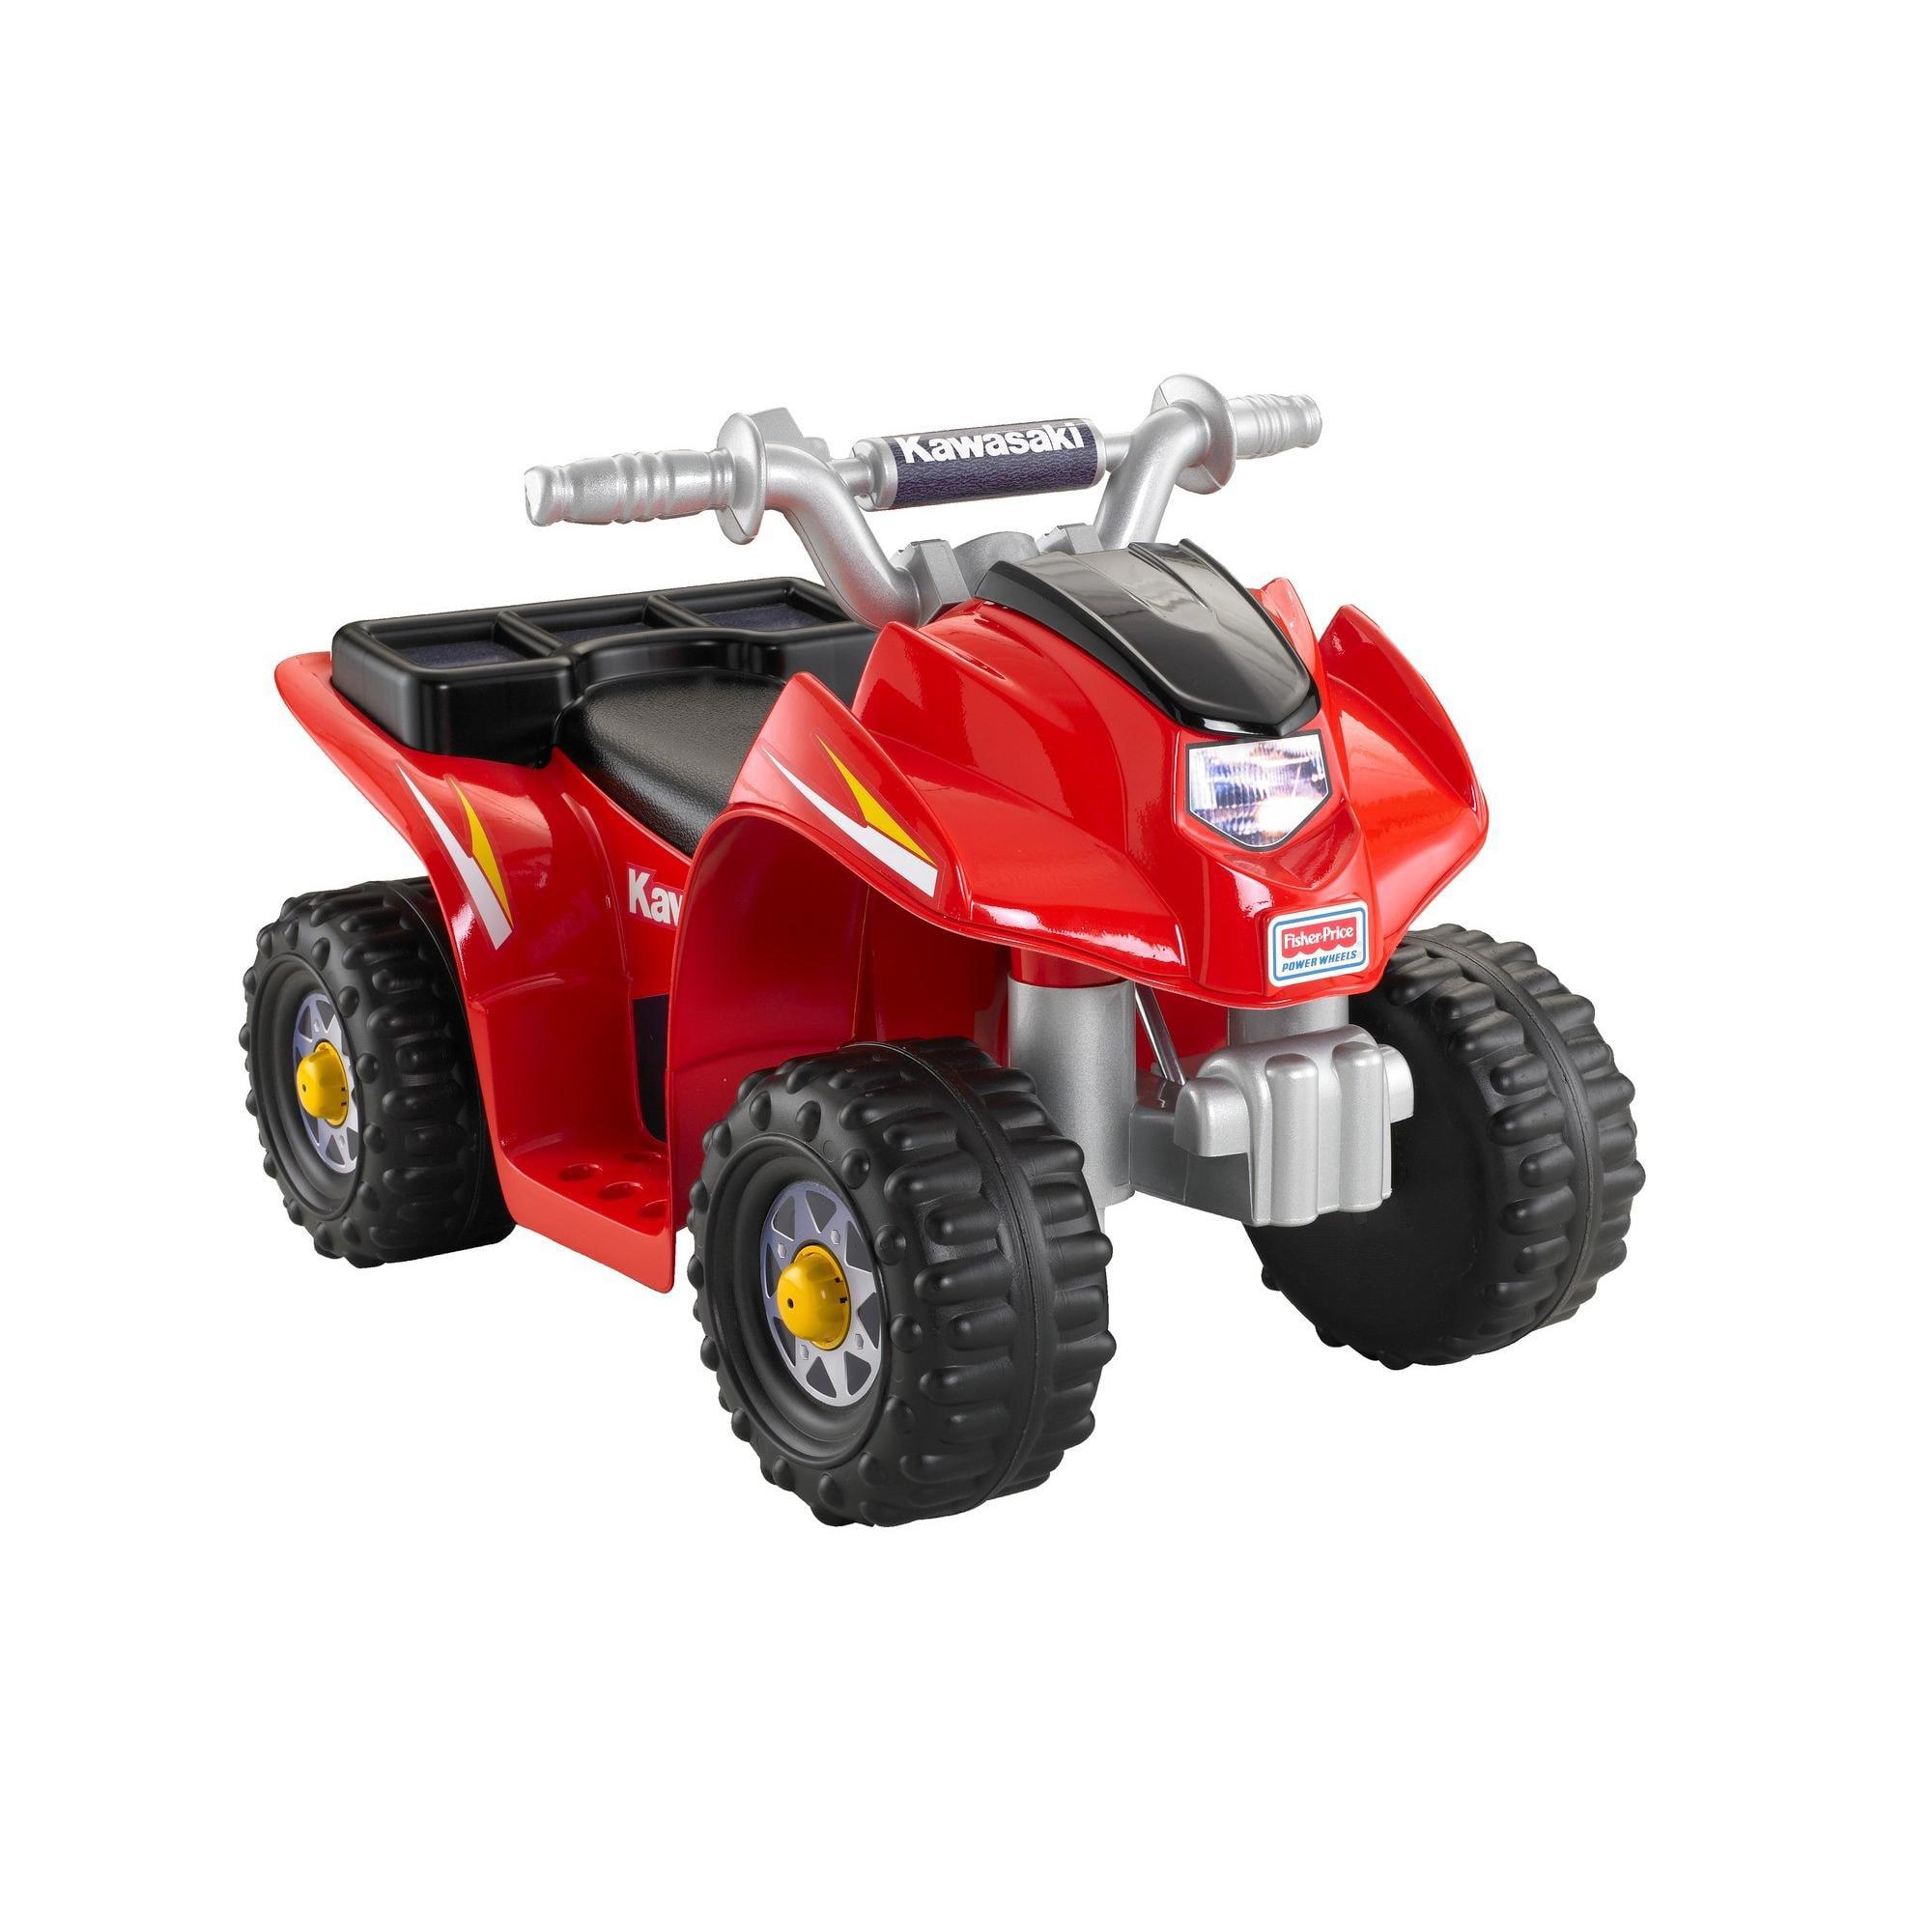 Power Wheels Lil' Kawasaki 6V Battery-Powered Ride-On Quad